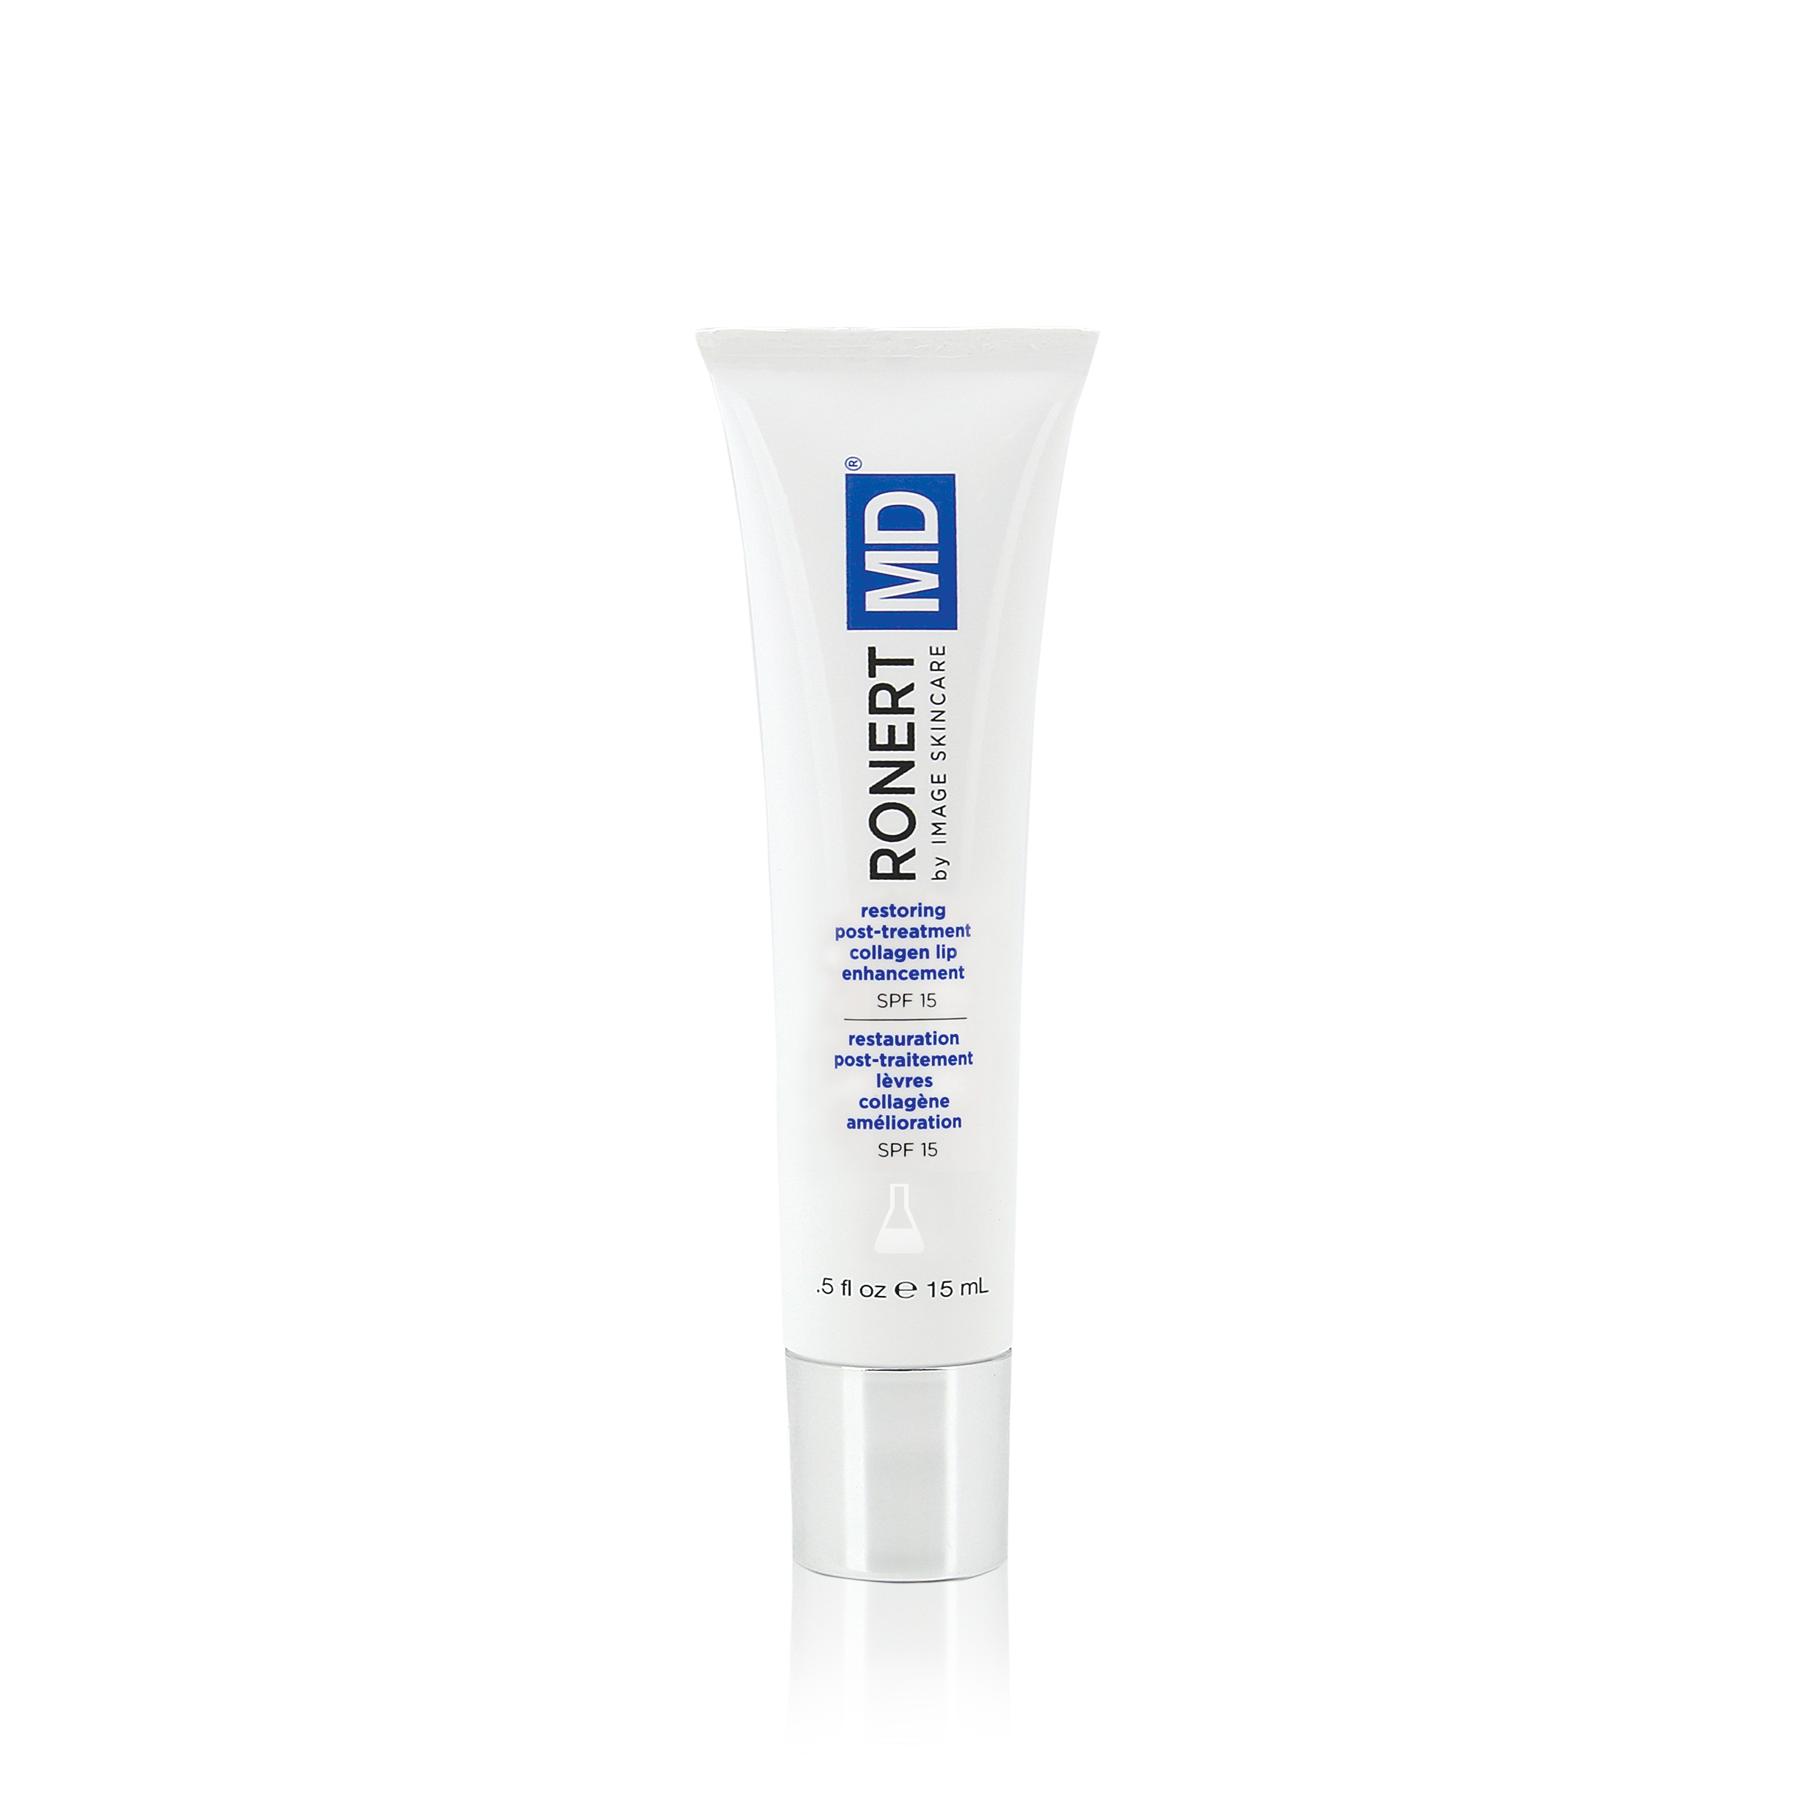 Image Skincare IMAGE MD Ronert MD Post Treatment Lip Enhancement SPF 15